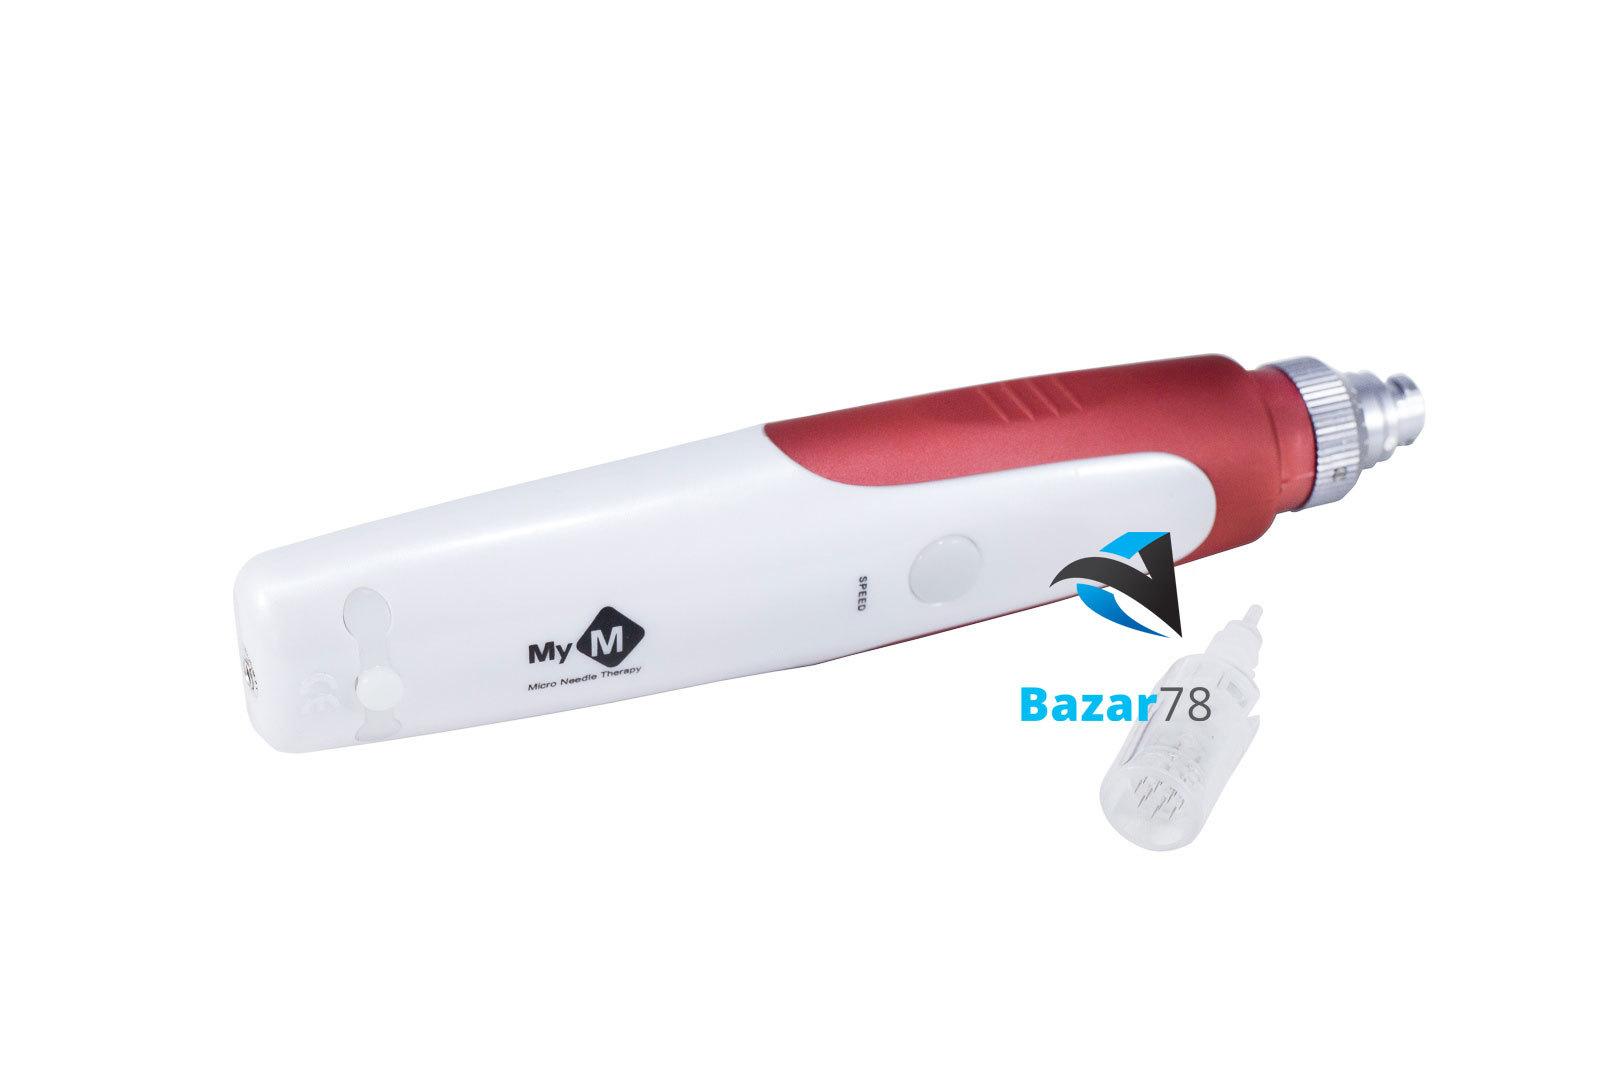 Аппарат для BB Glow фракционной мезотерапии ( дермапен )